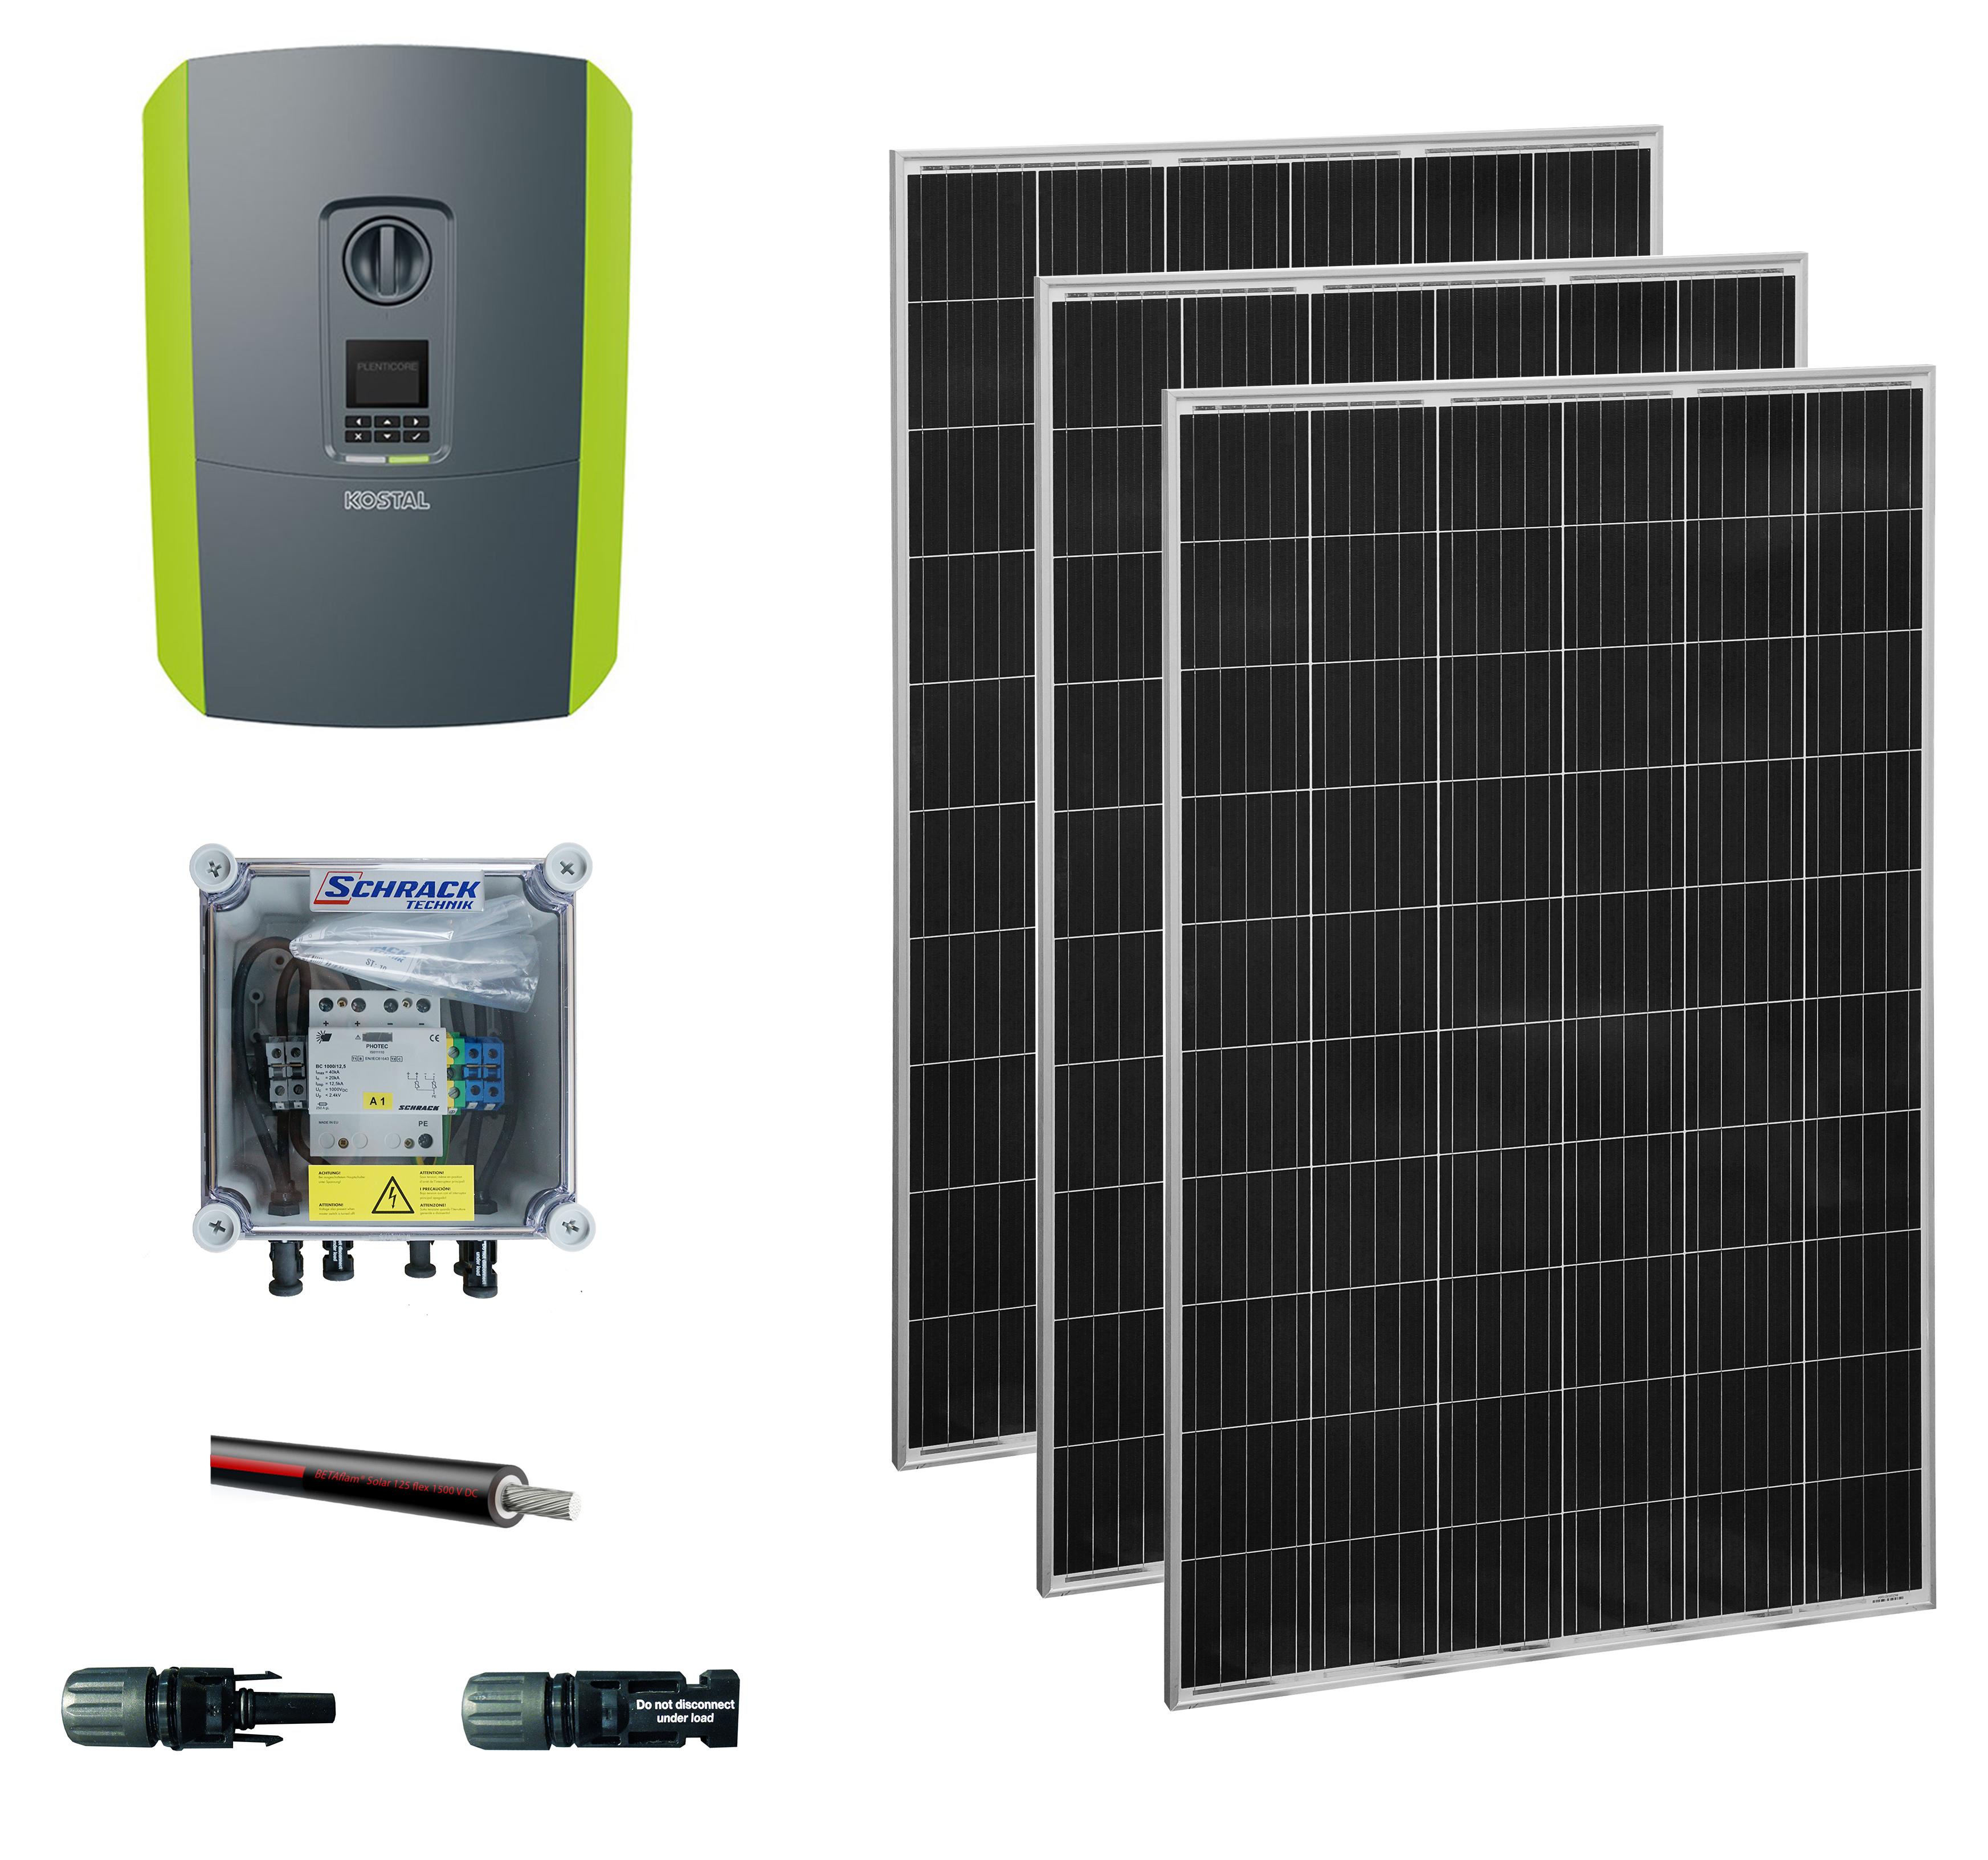 1 Stk PV-Aktionsset 5kW: 20Module,1 WR,ÜA,100m Kabel,MoSys Ziegel PVS52030--